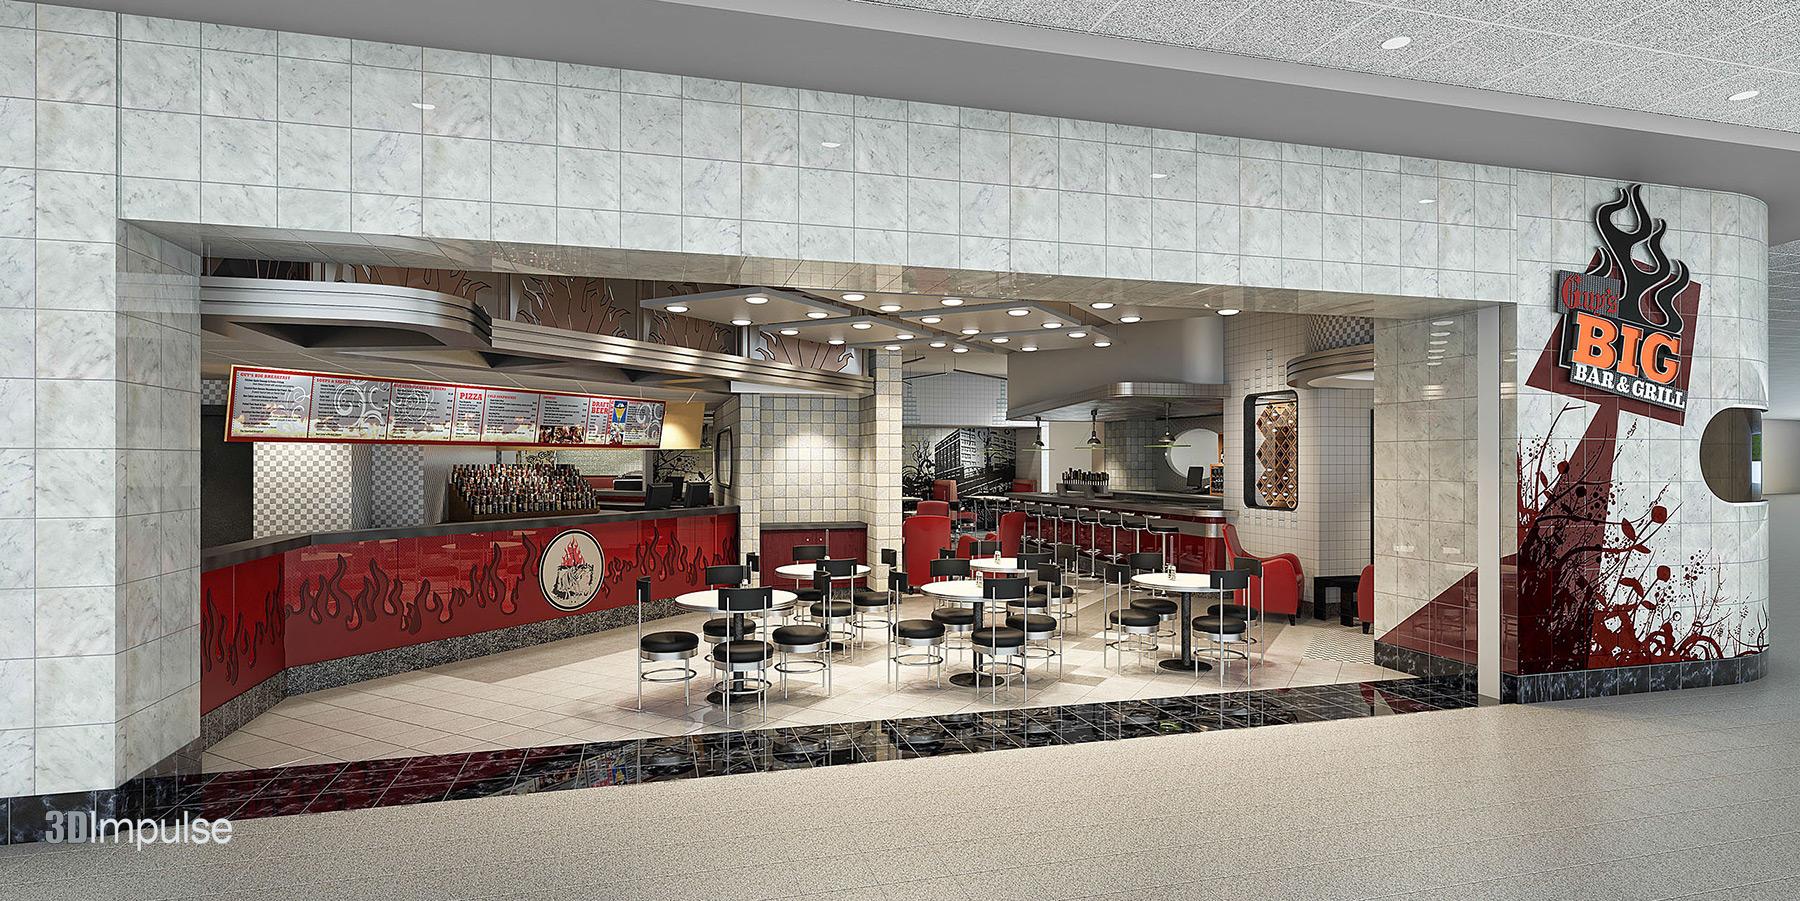 Airport-Restaurant-Diner-Storefront